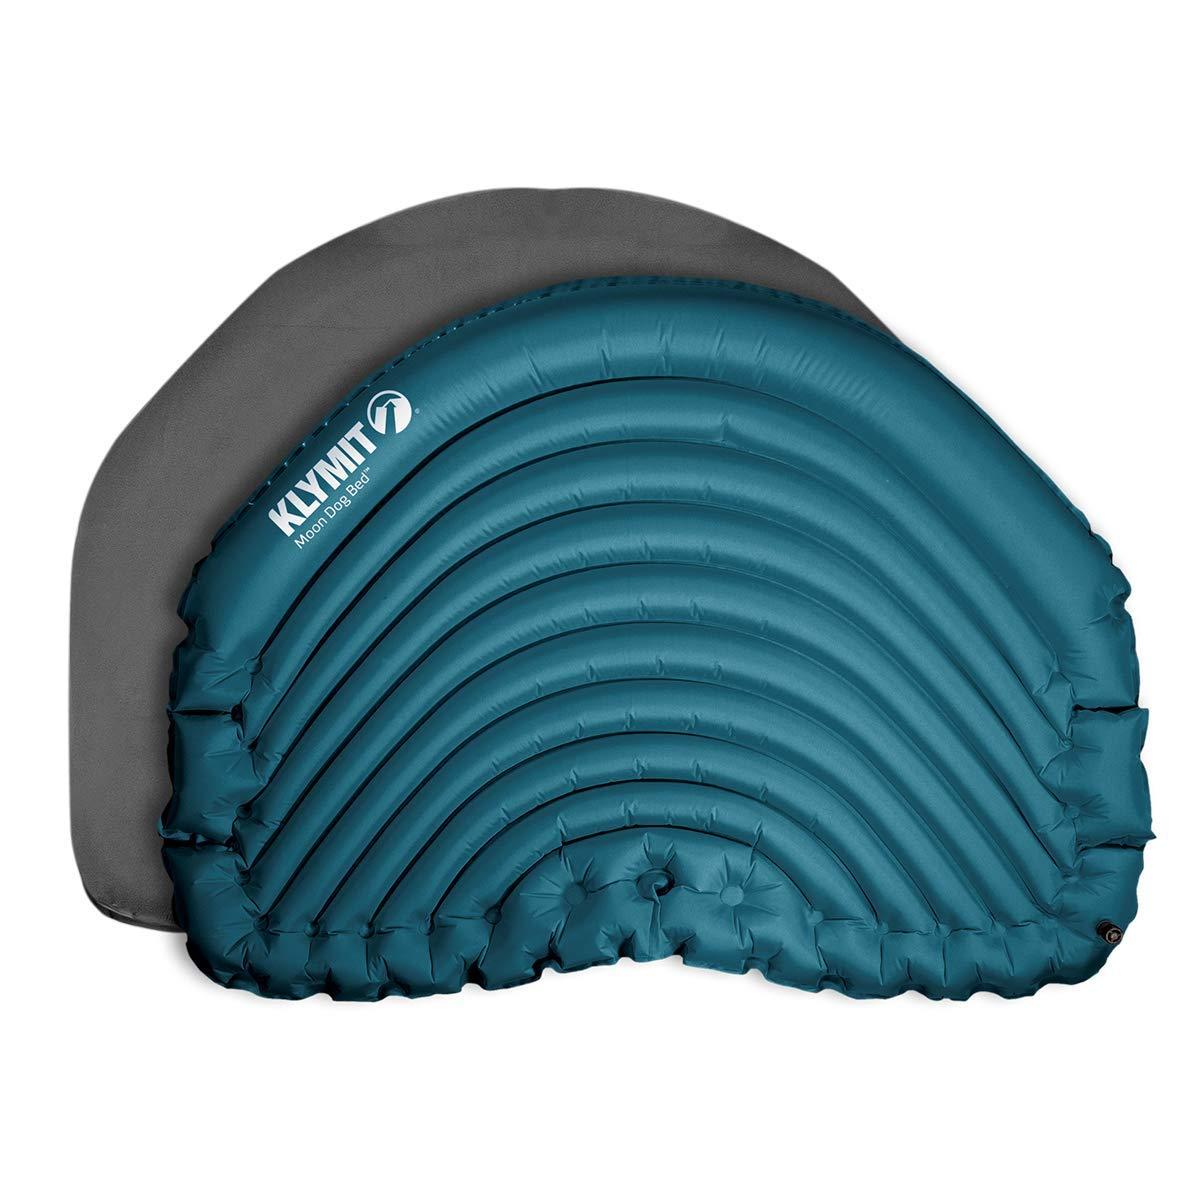 Klymit Unisex's Moon Dog Bed, Small Medium, bluee Black, One size